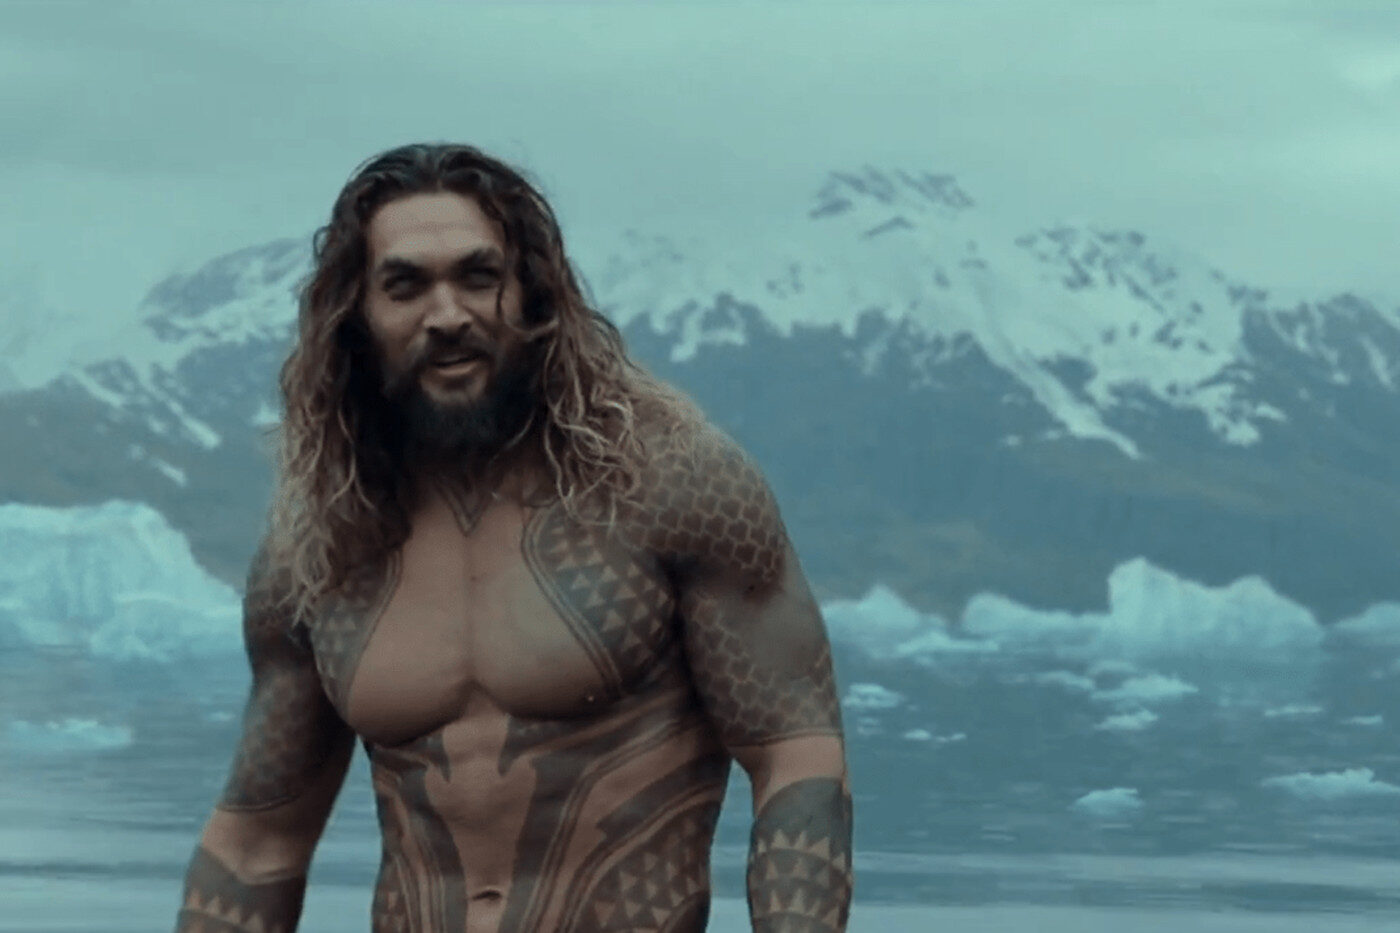 Jason Momoa in Aquaman 2